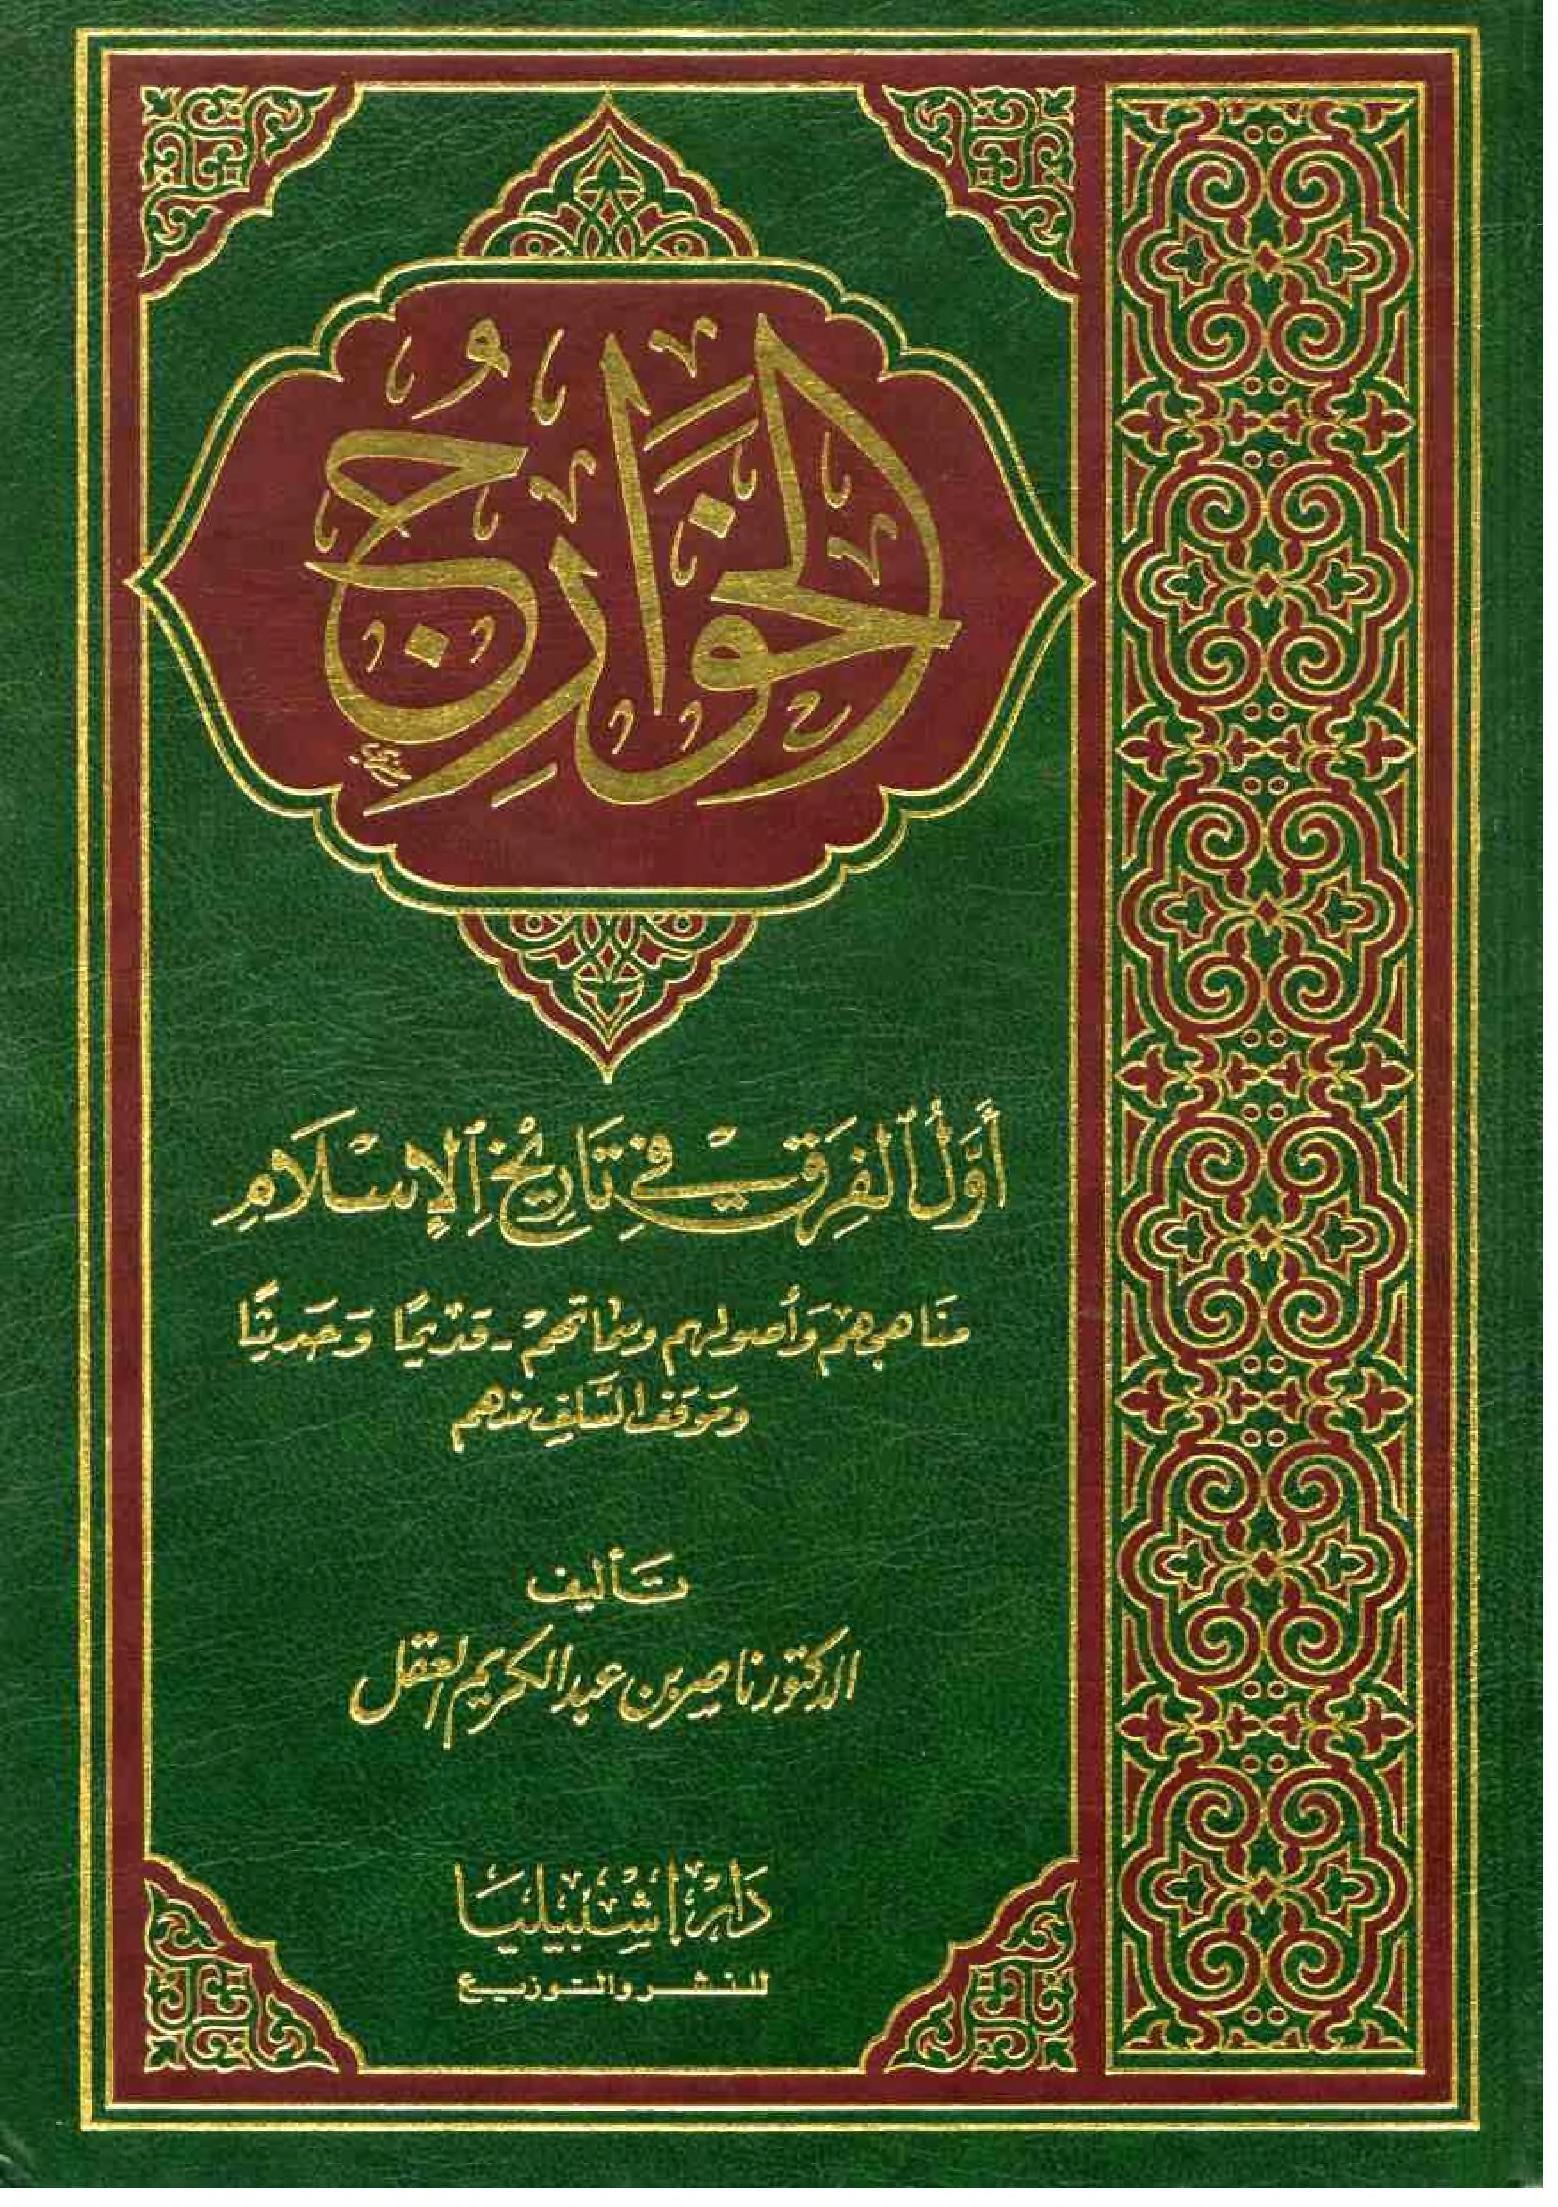 الخوارج أول الفرق في تاريخ الإسلام Free Download Borrow And Streaming Internet Archive Pdf Books Reading Free Pdf Books Arabic Books